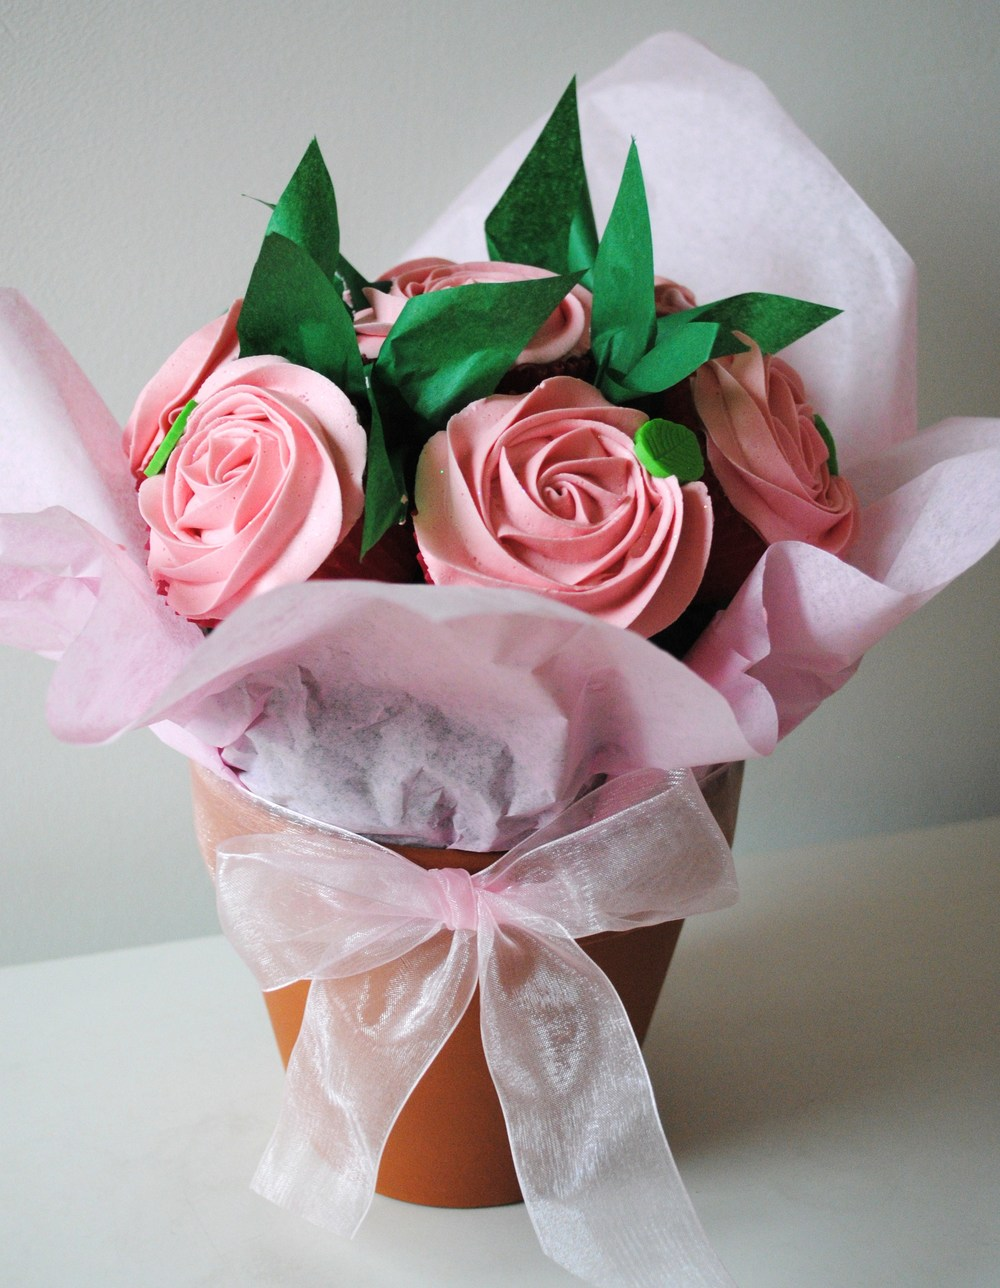 Cupcake bouquets nanettes kitchen rose garden small 5 6 cupcakes 45 large 8 9 cupcakes 65 izmirmasajfo